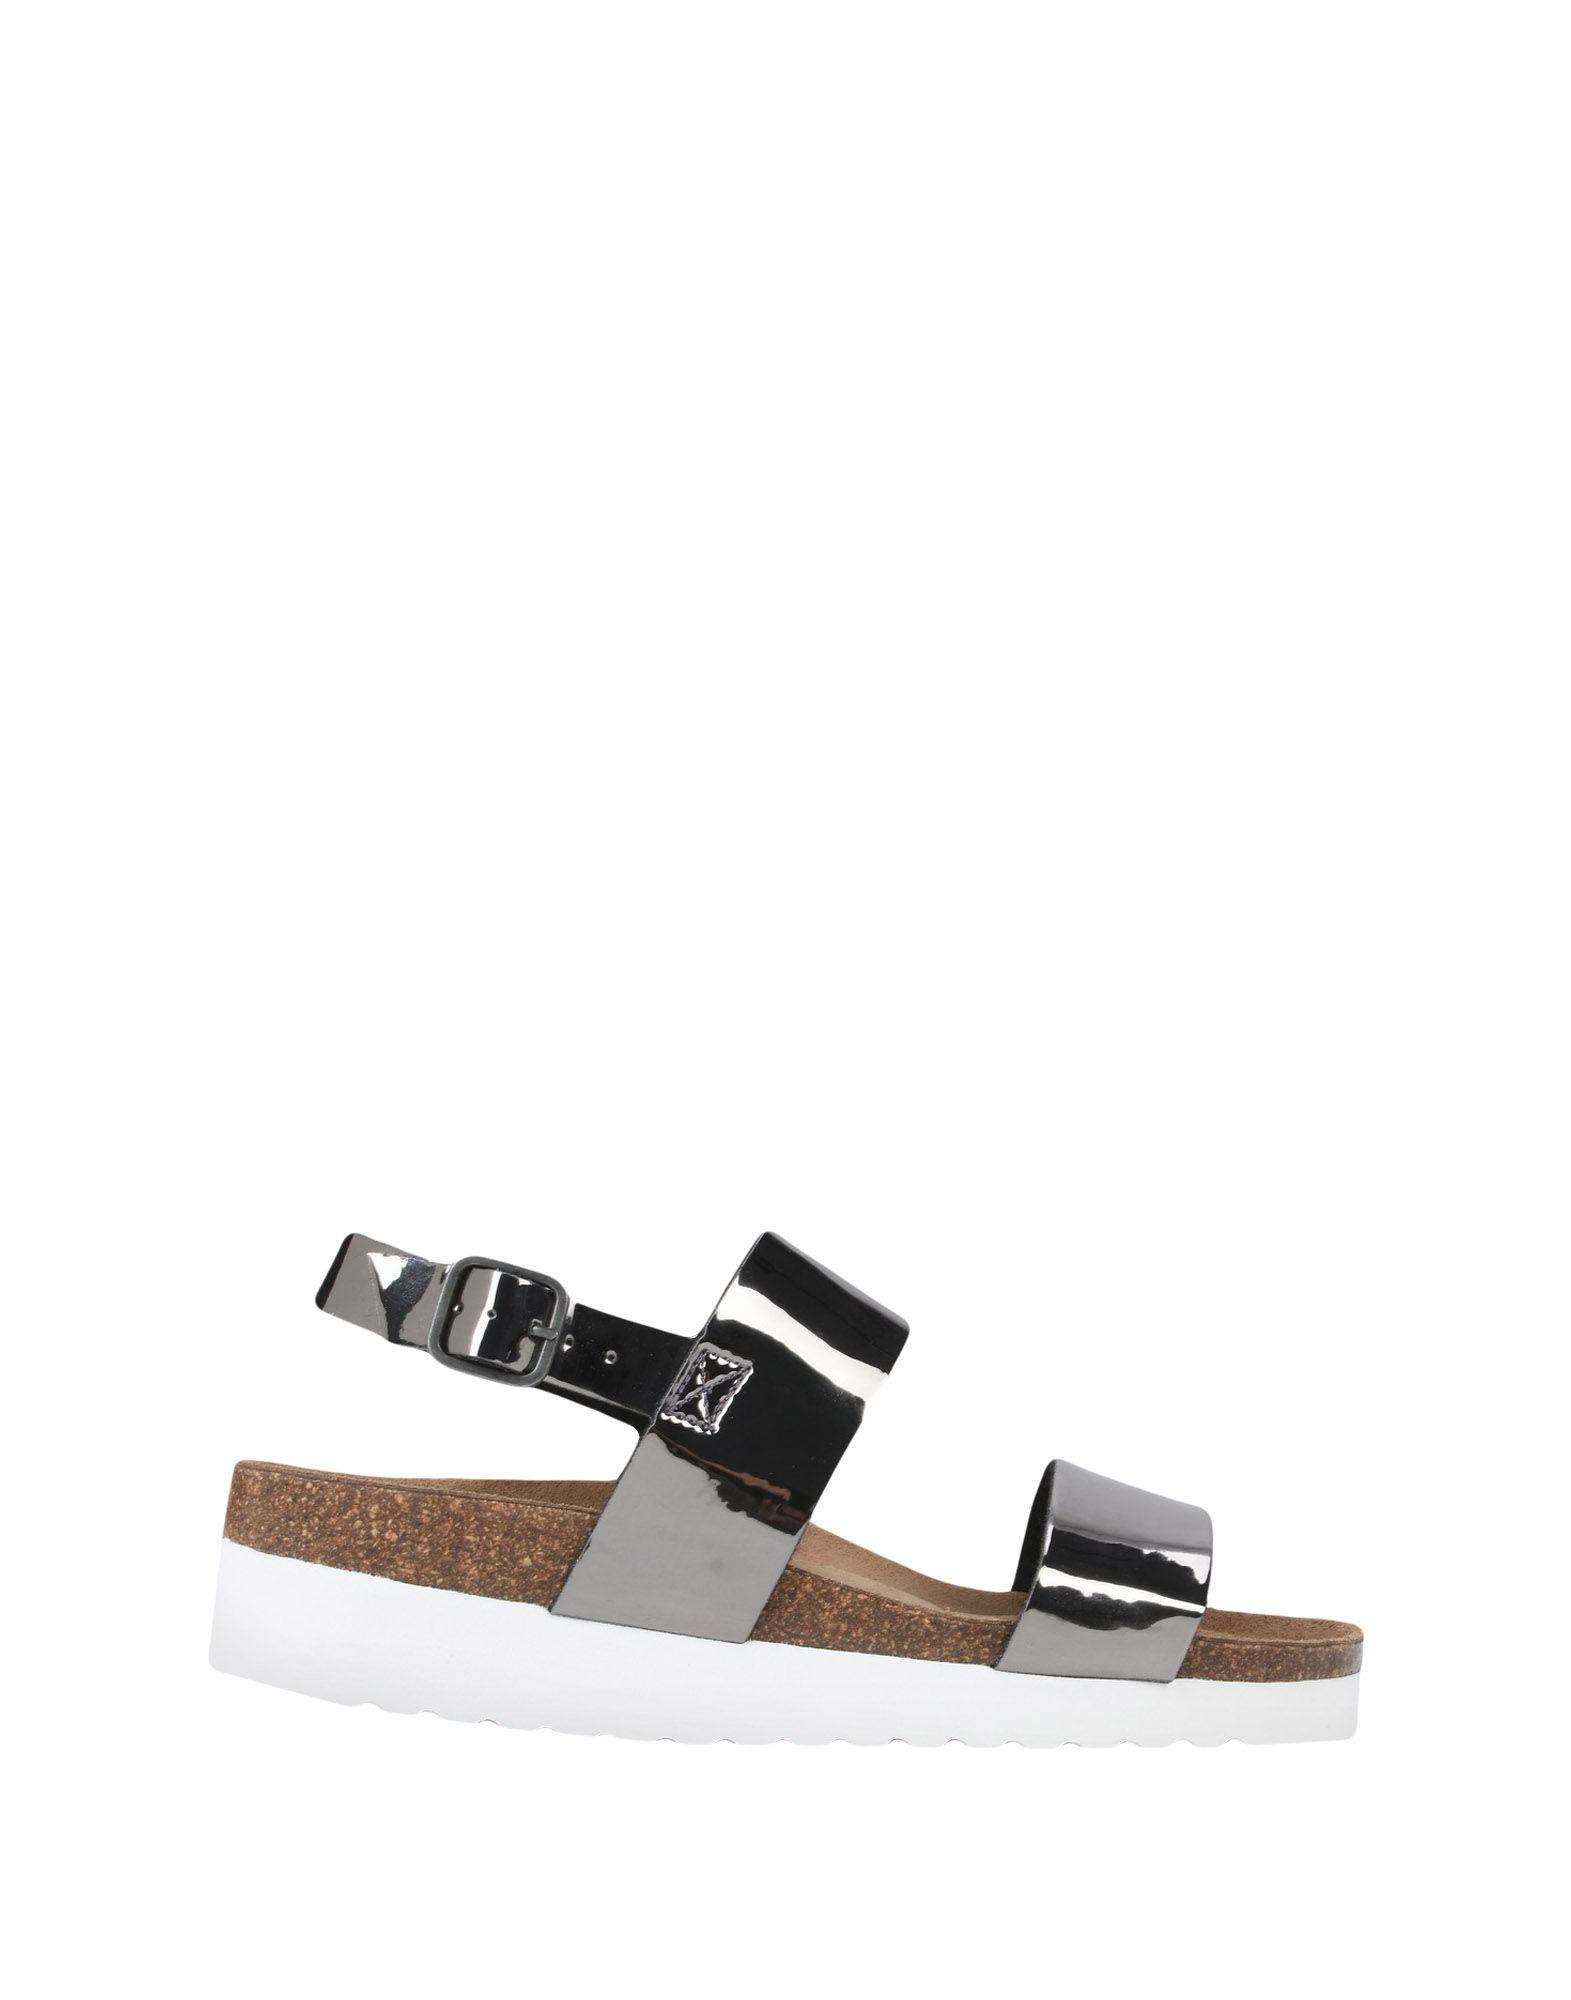 Chaussures - Sandales Maison Shoeshibar Plh5RpM